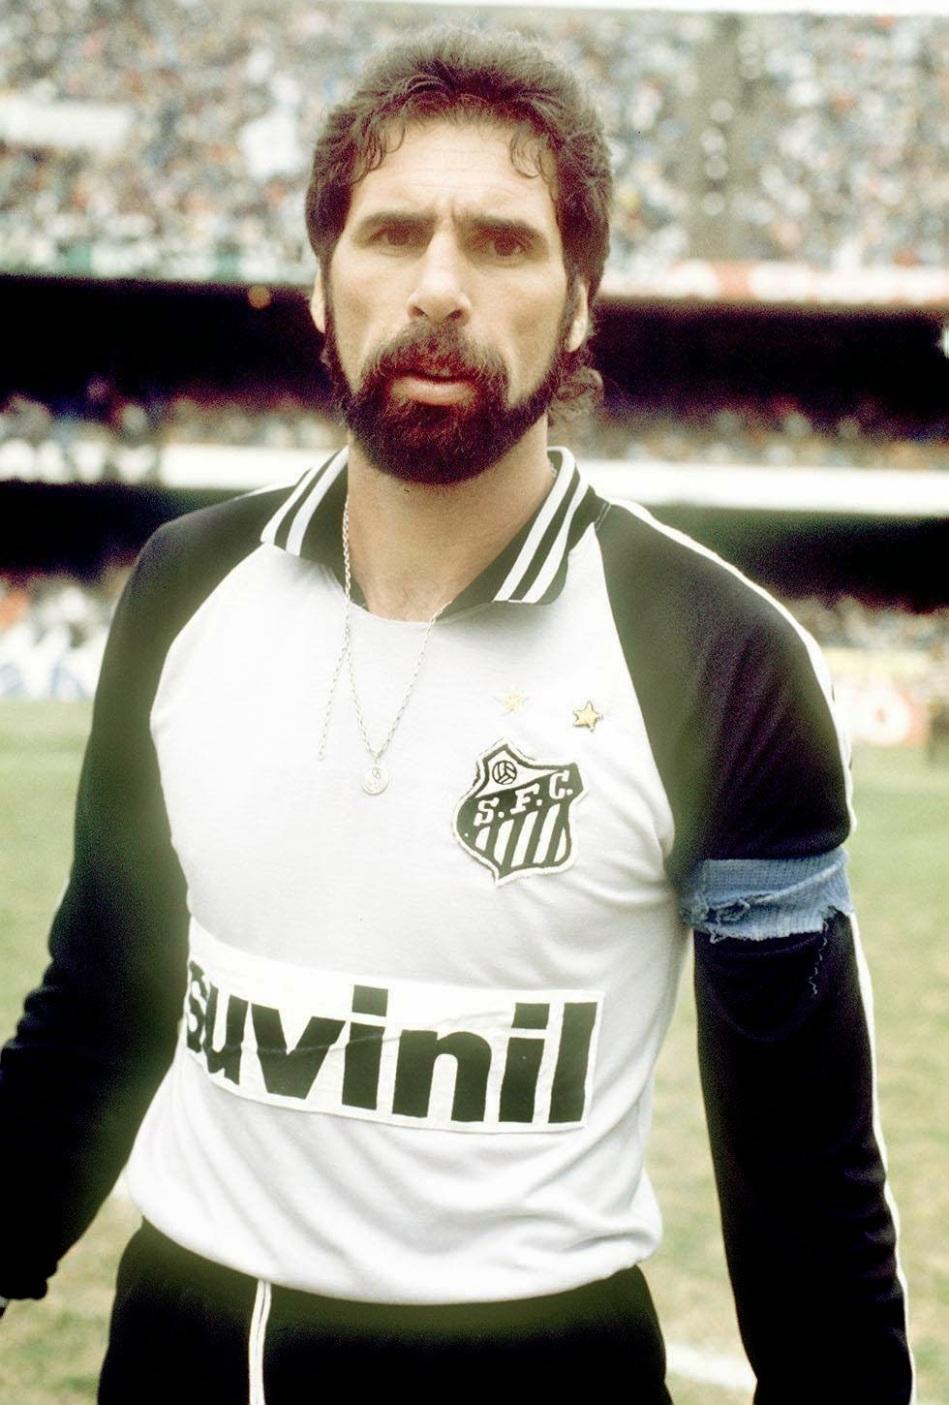 20-de-janeiro-rodolfo-rodriguez-ex-futebolista-uruguaio